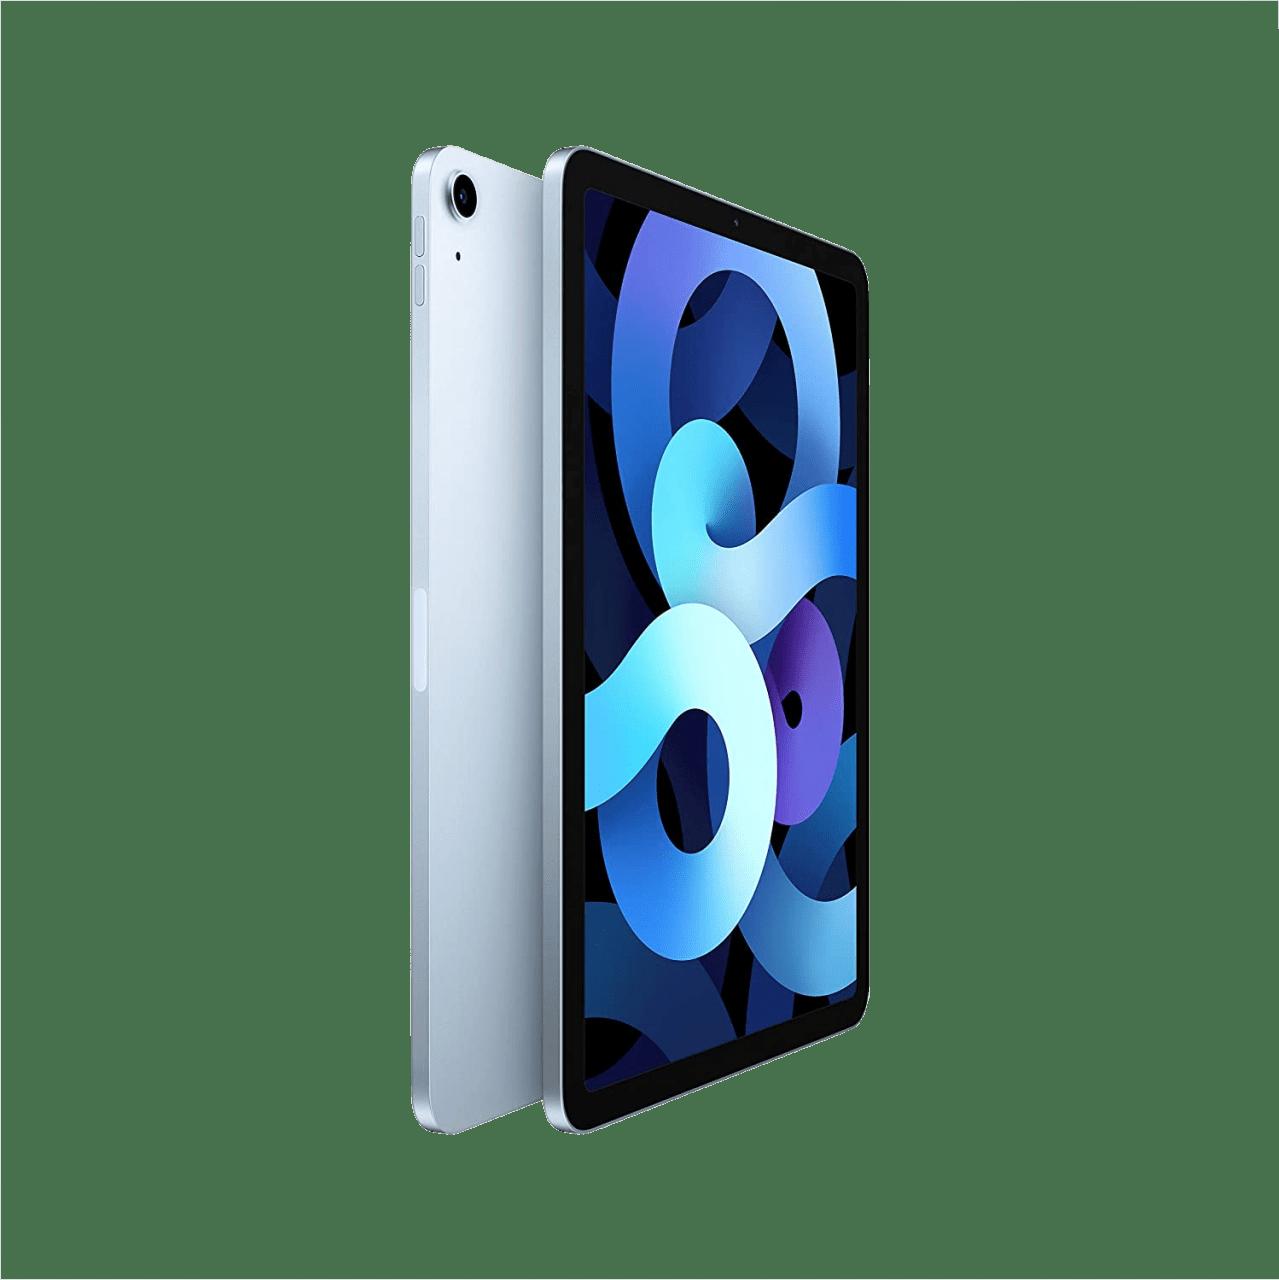 Blau Apple iPad Air (2020) - WiFi - iOS14 - 64GB.2